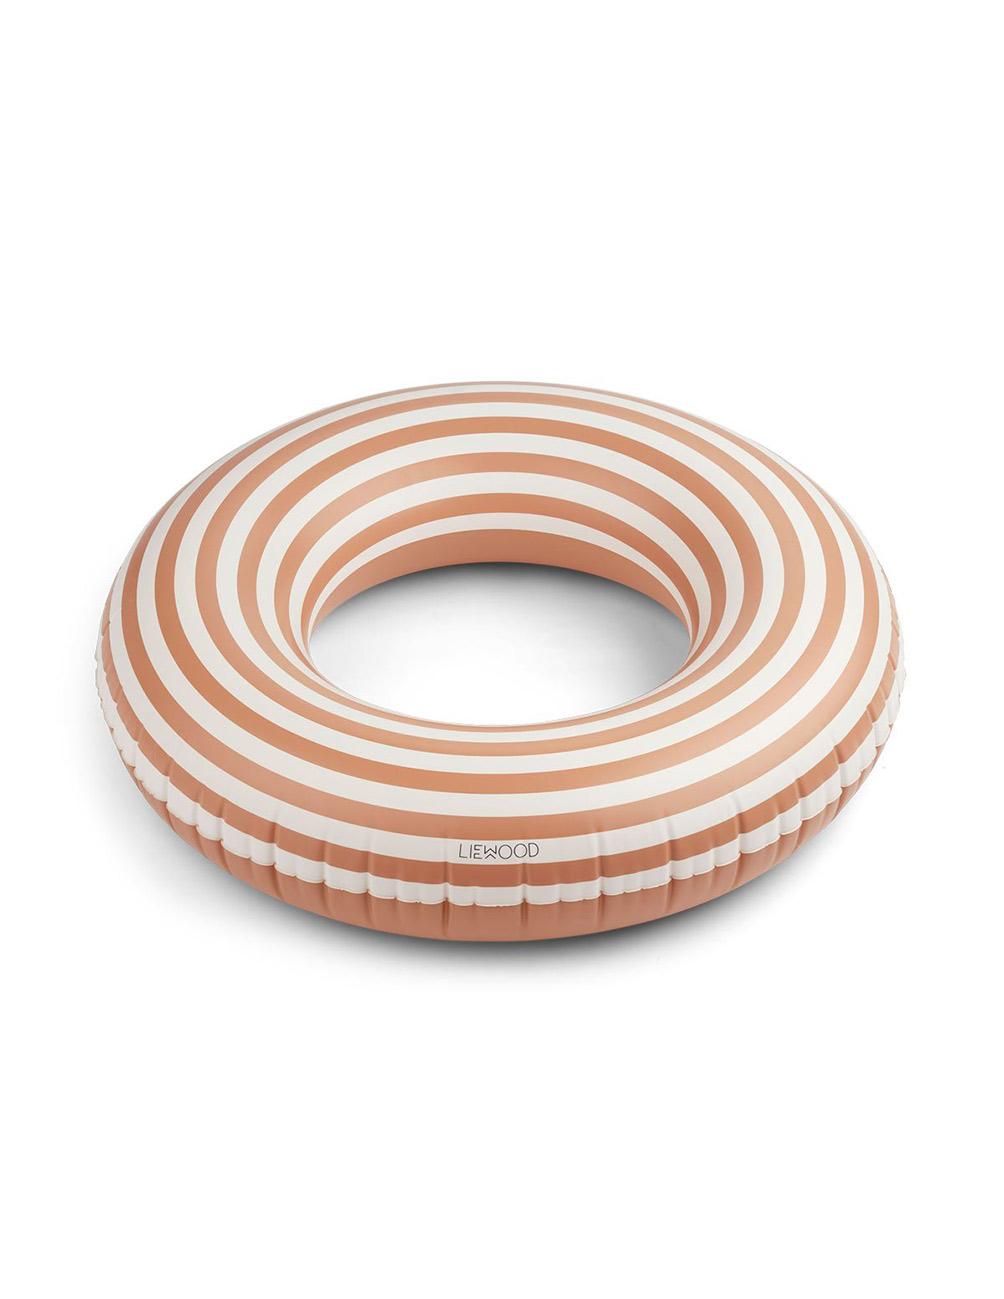 Donna Tuscany/Creme Swim Ring